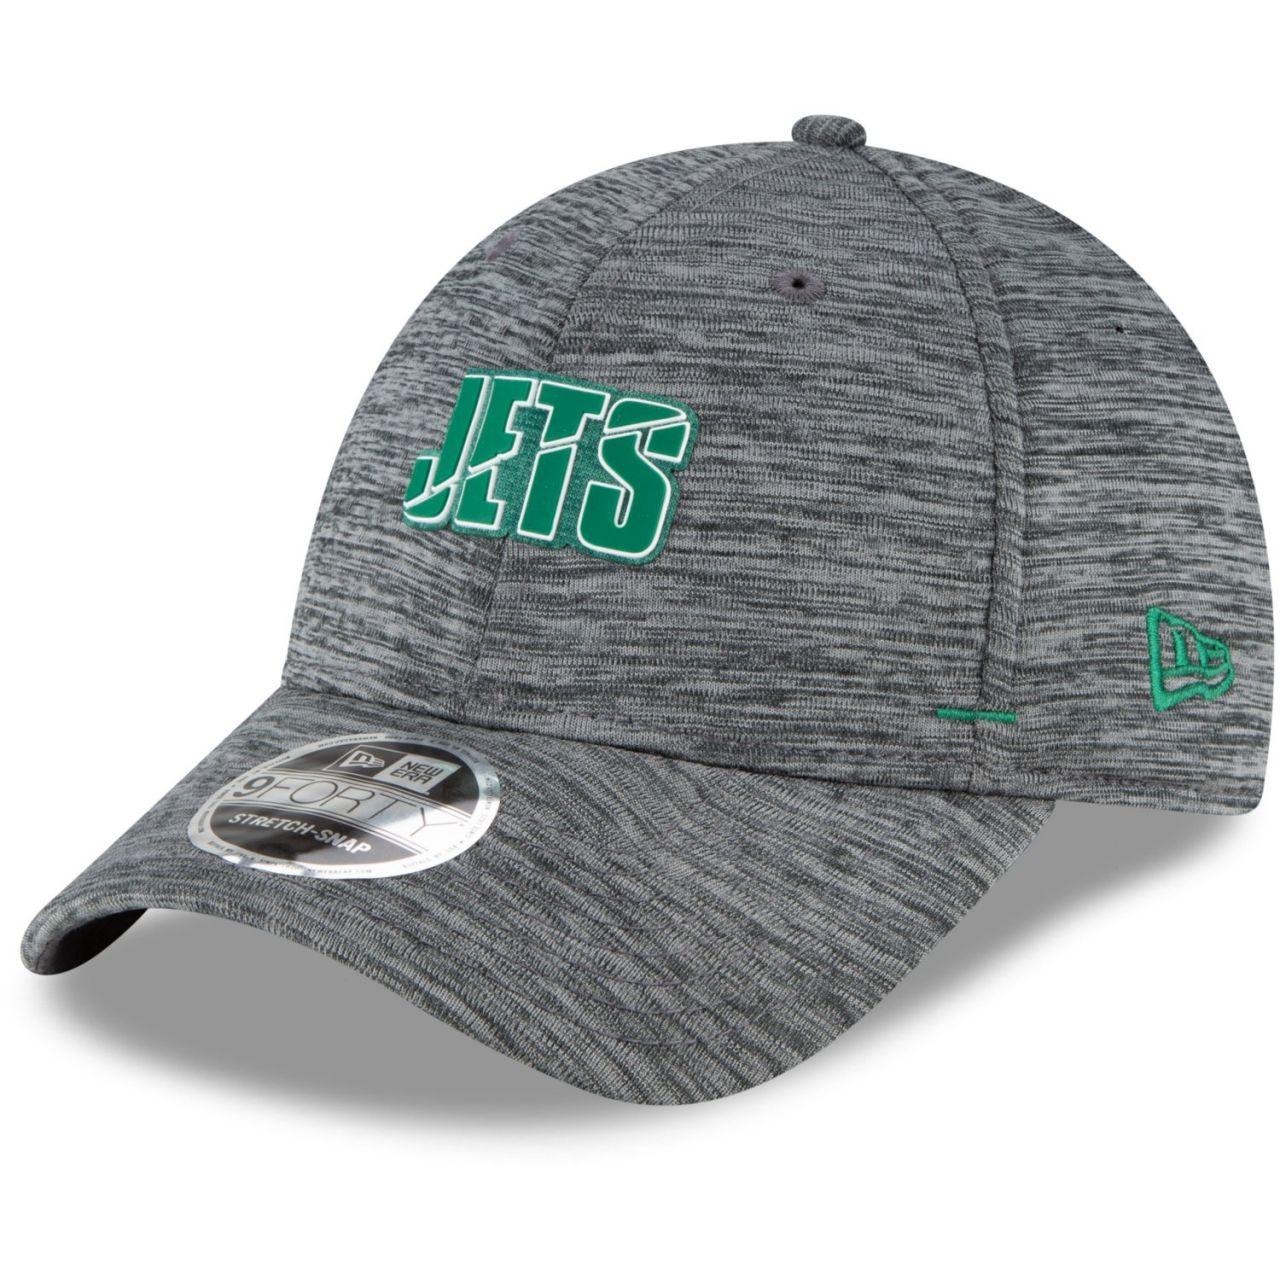 amfoo - New Era 9FORTY Stretch Cap - NFL CAMP New York Jets